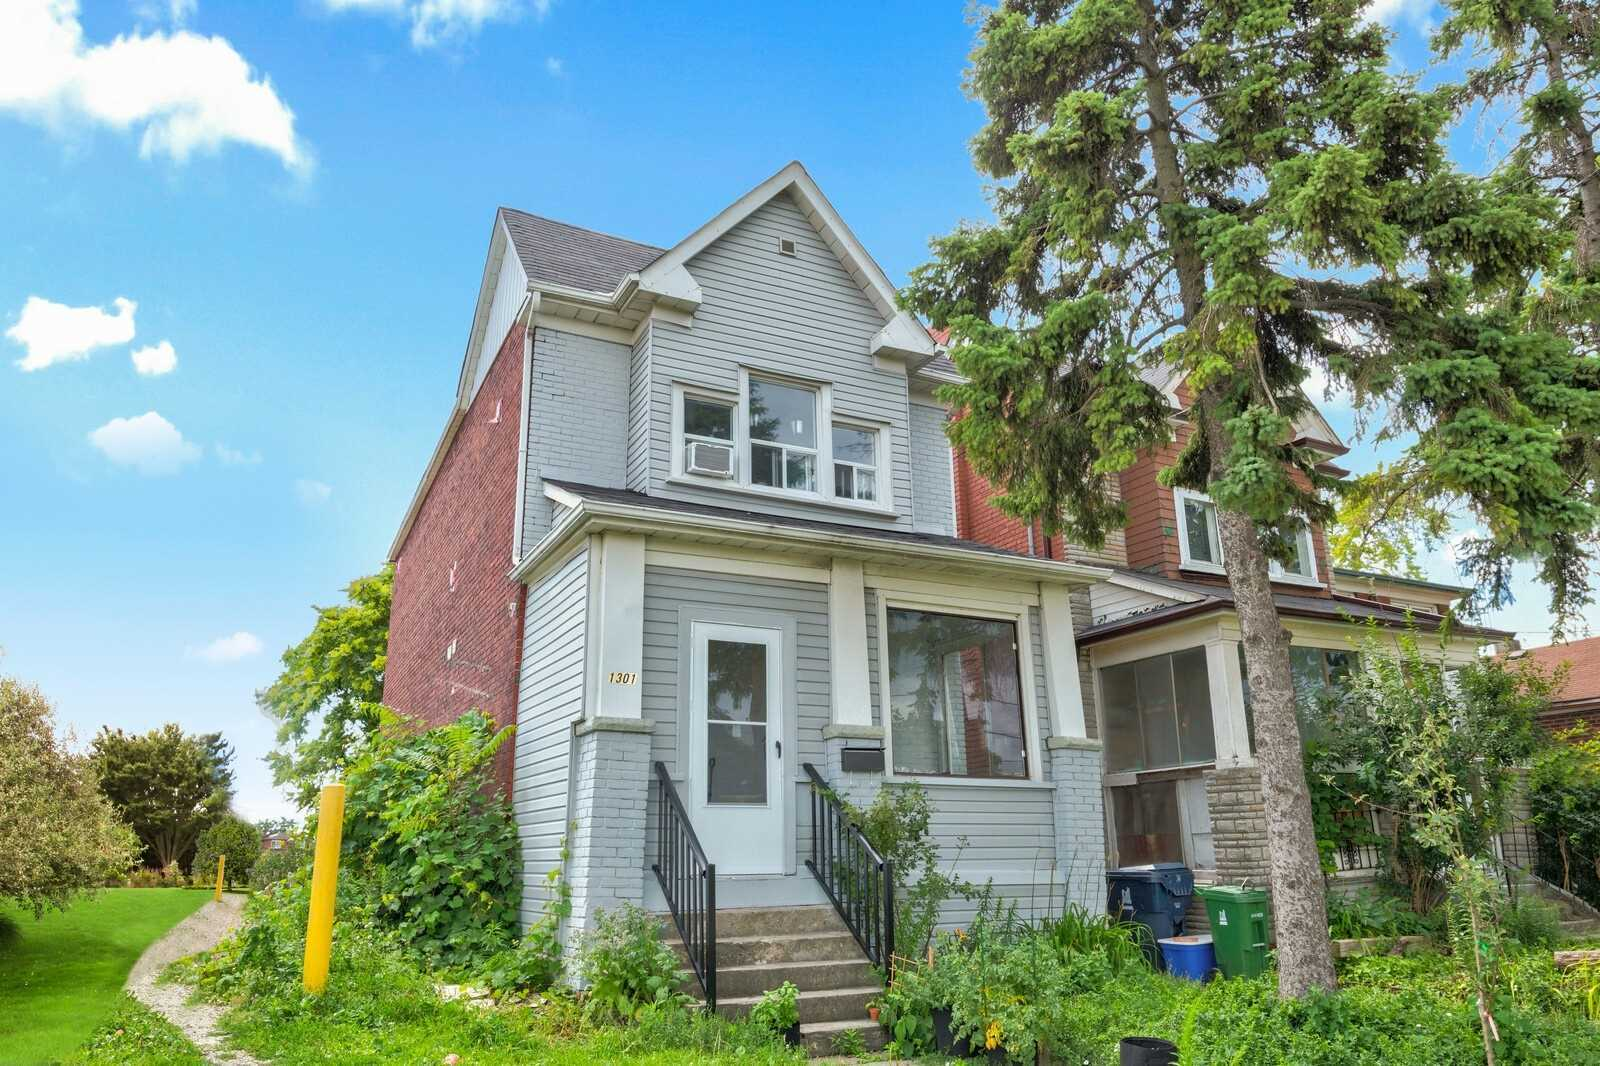 1301 Dupont St, Toronto, M6H2A5